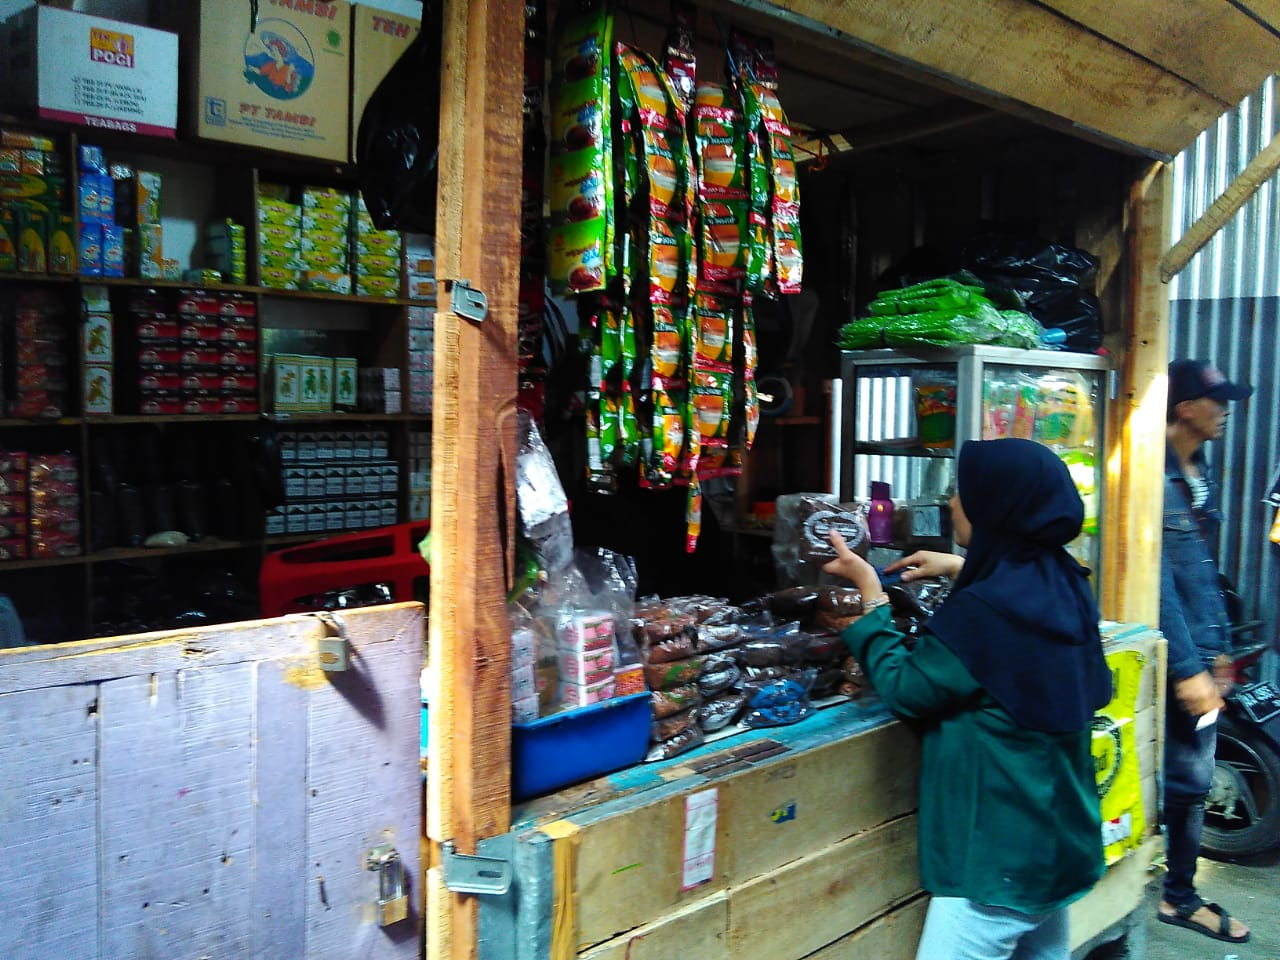 Empat Tahun Pasca Kebakaran Dua Kali Pindah Lapak Di Penampungan Pasar Induk Wonosobo